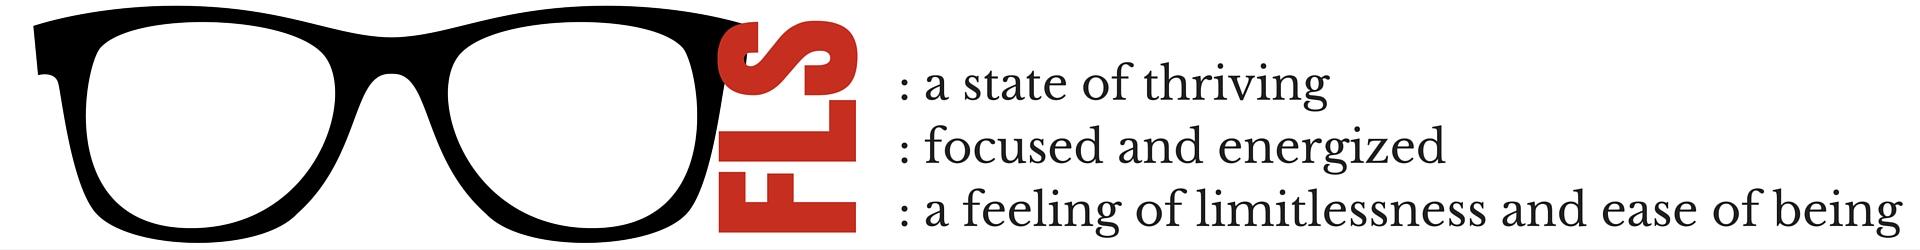 FLS Definition